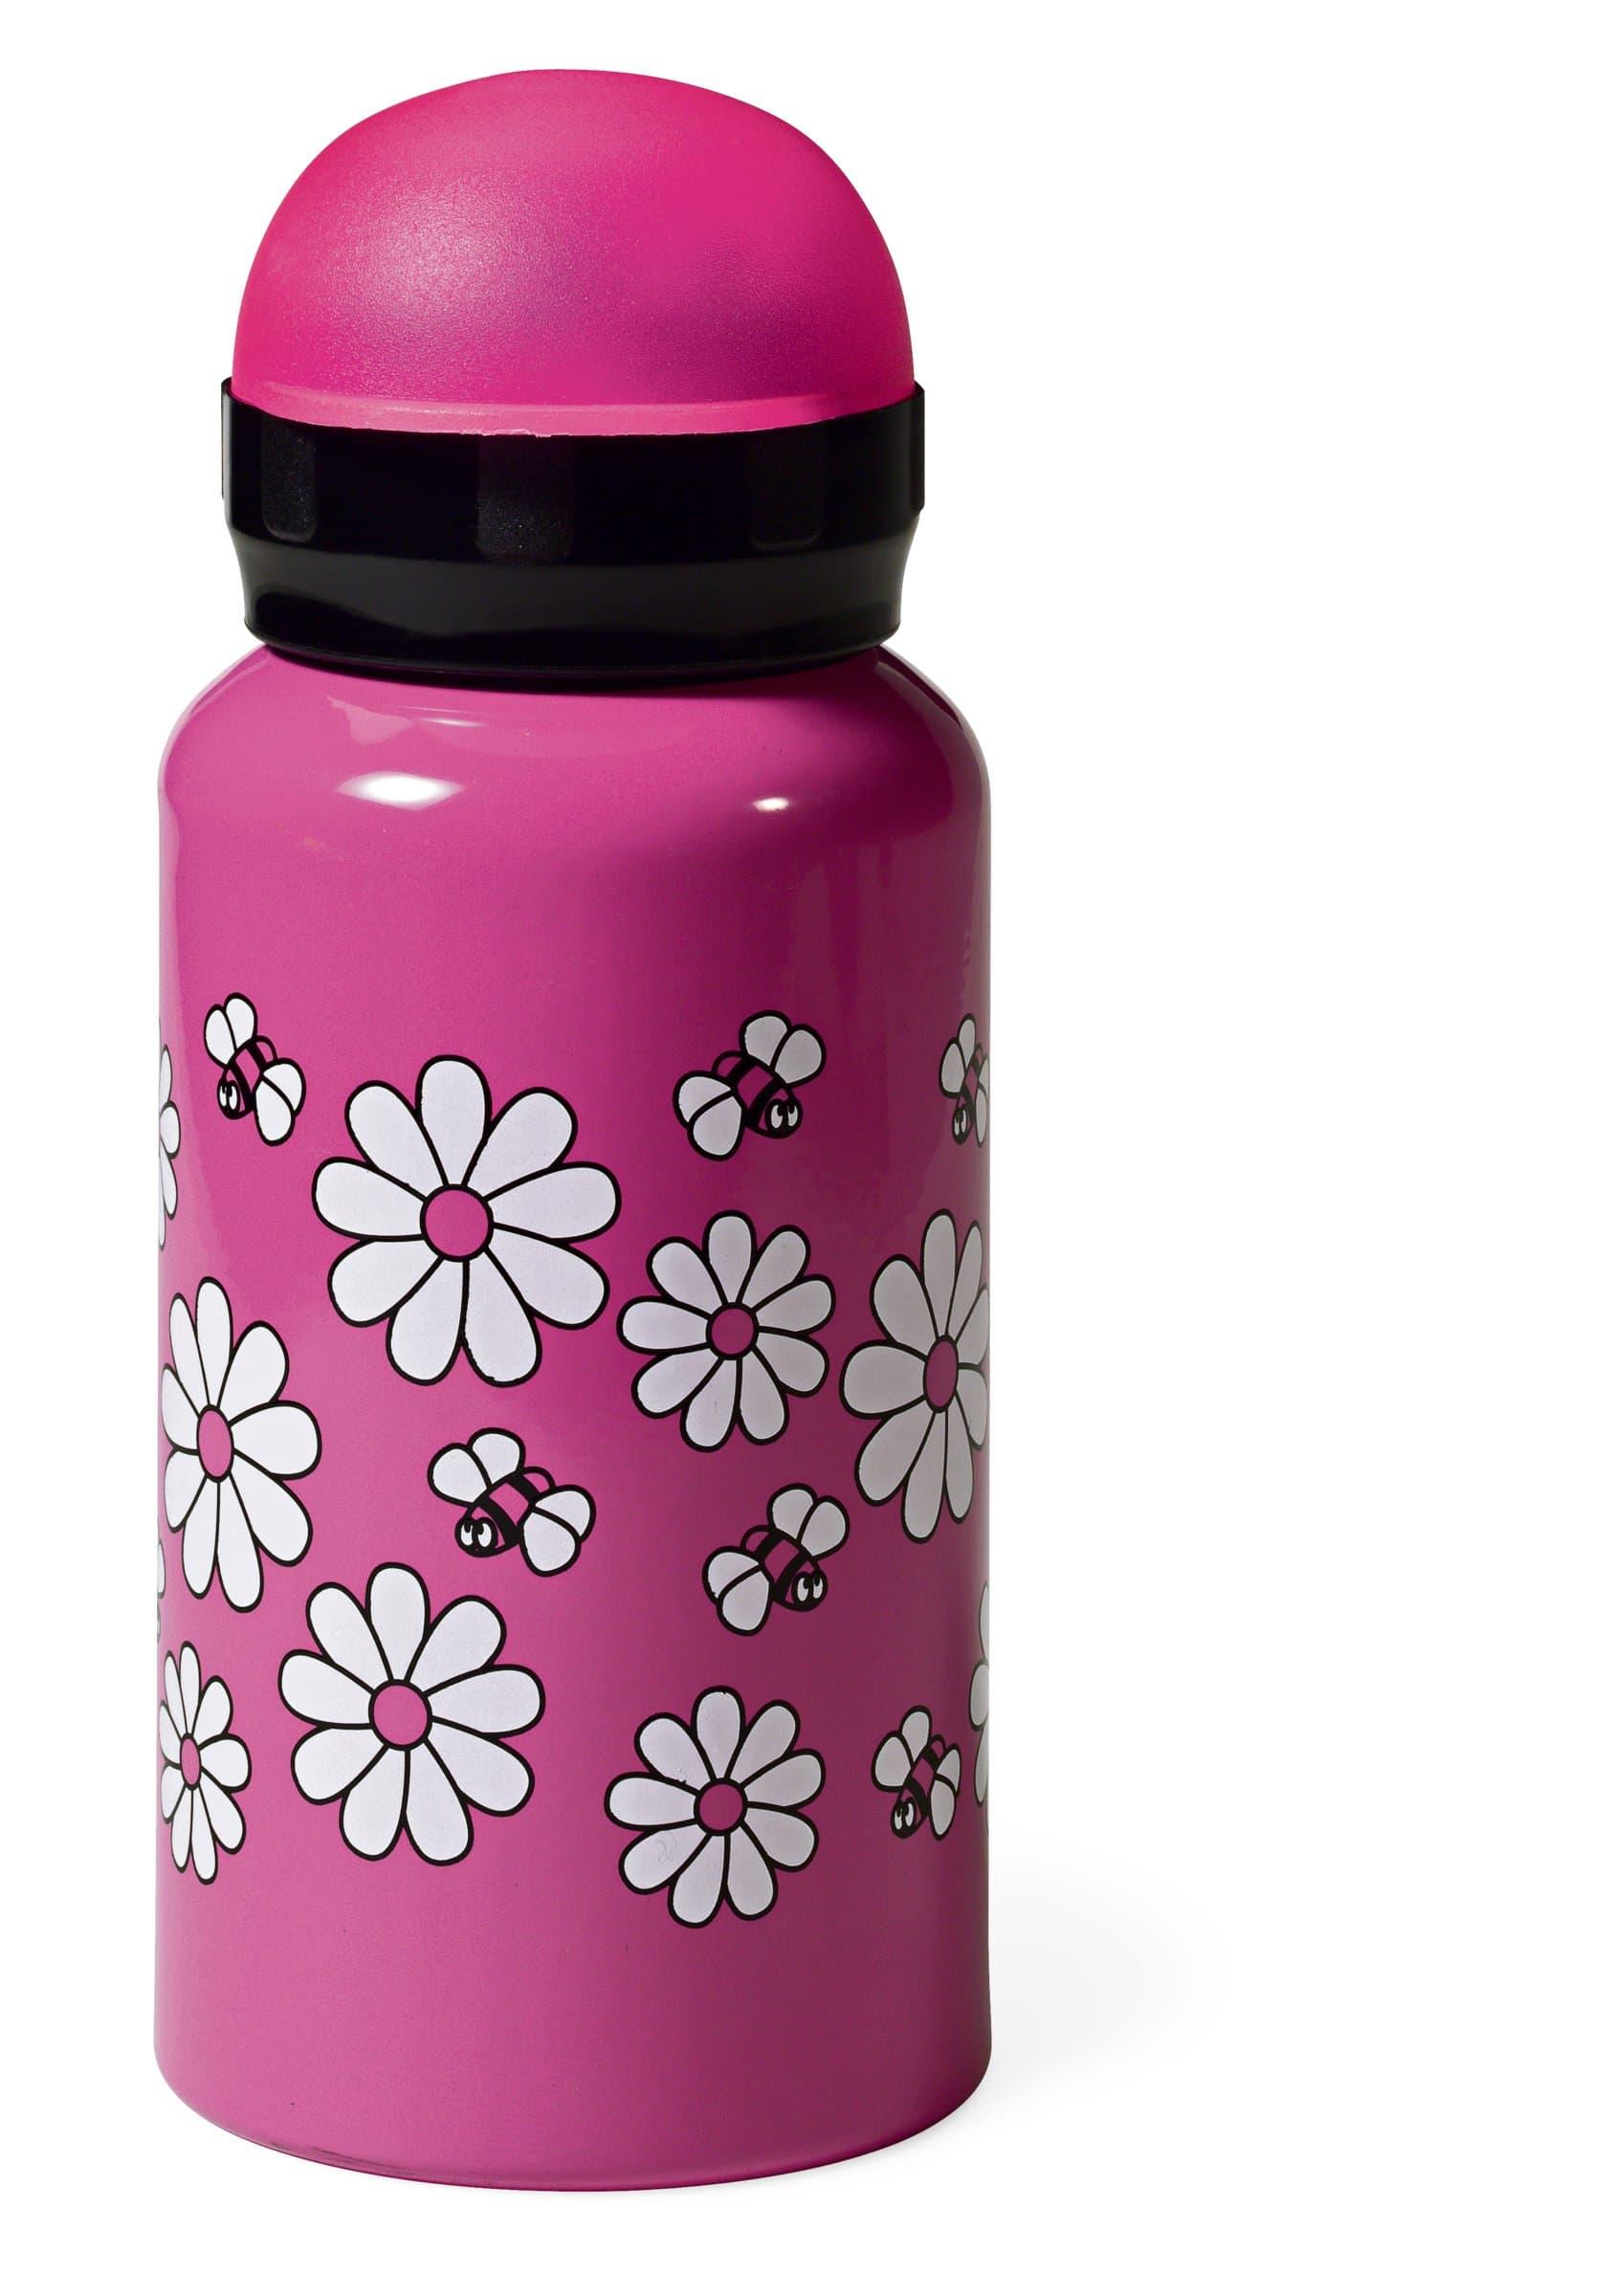 Laken FIORE Bottiglia